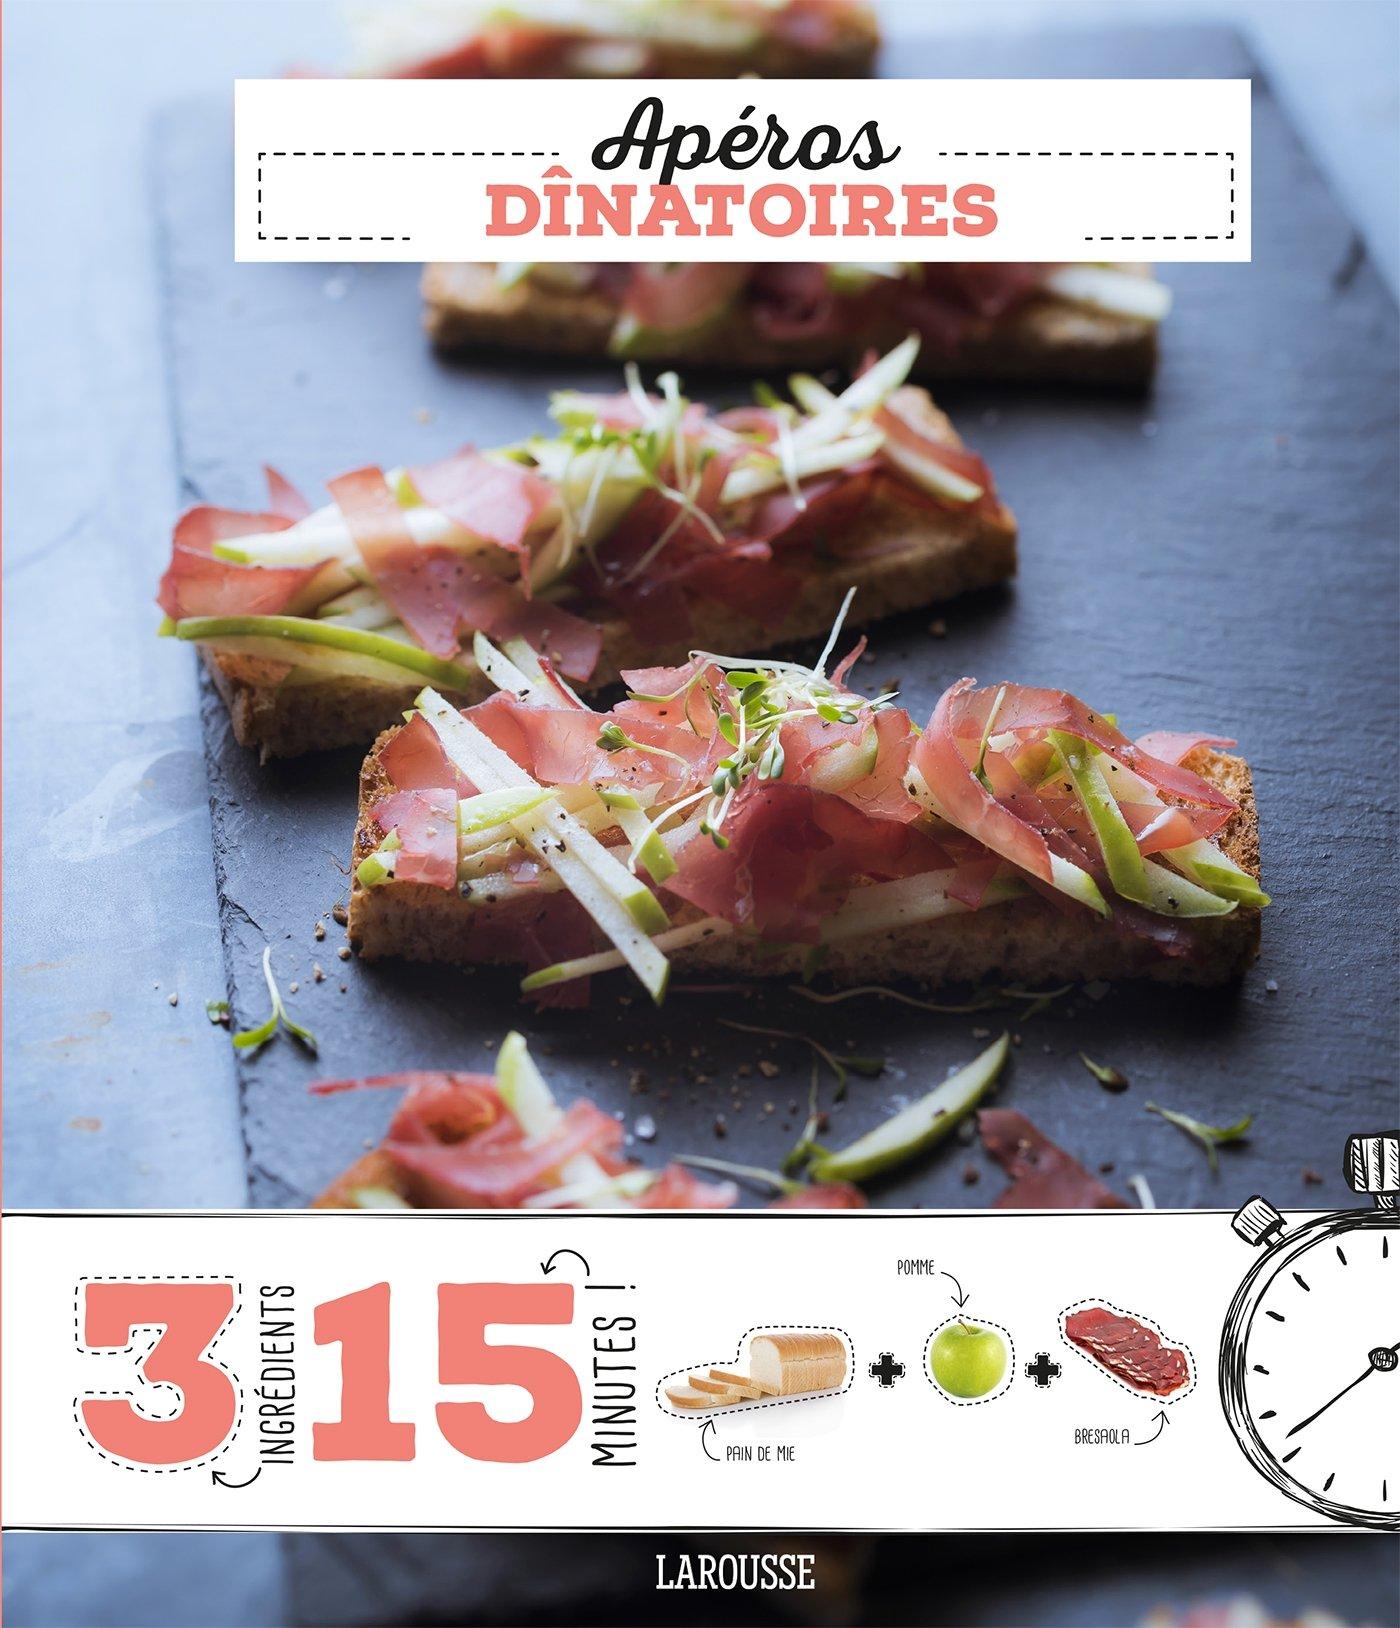 Apéros dînatoires Broché – 20 mai 2015 Collectif Larousse 2035904439 Cuisine